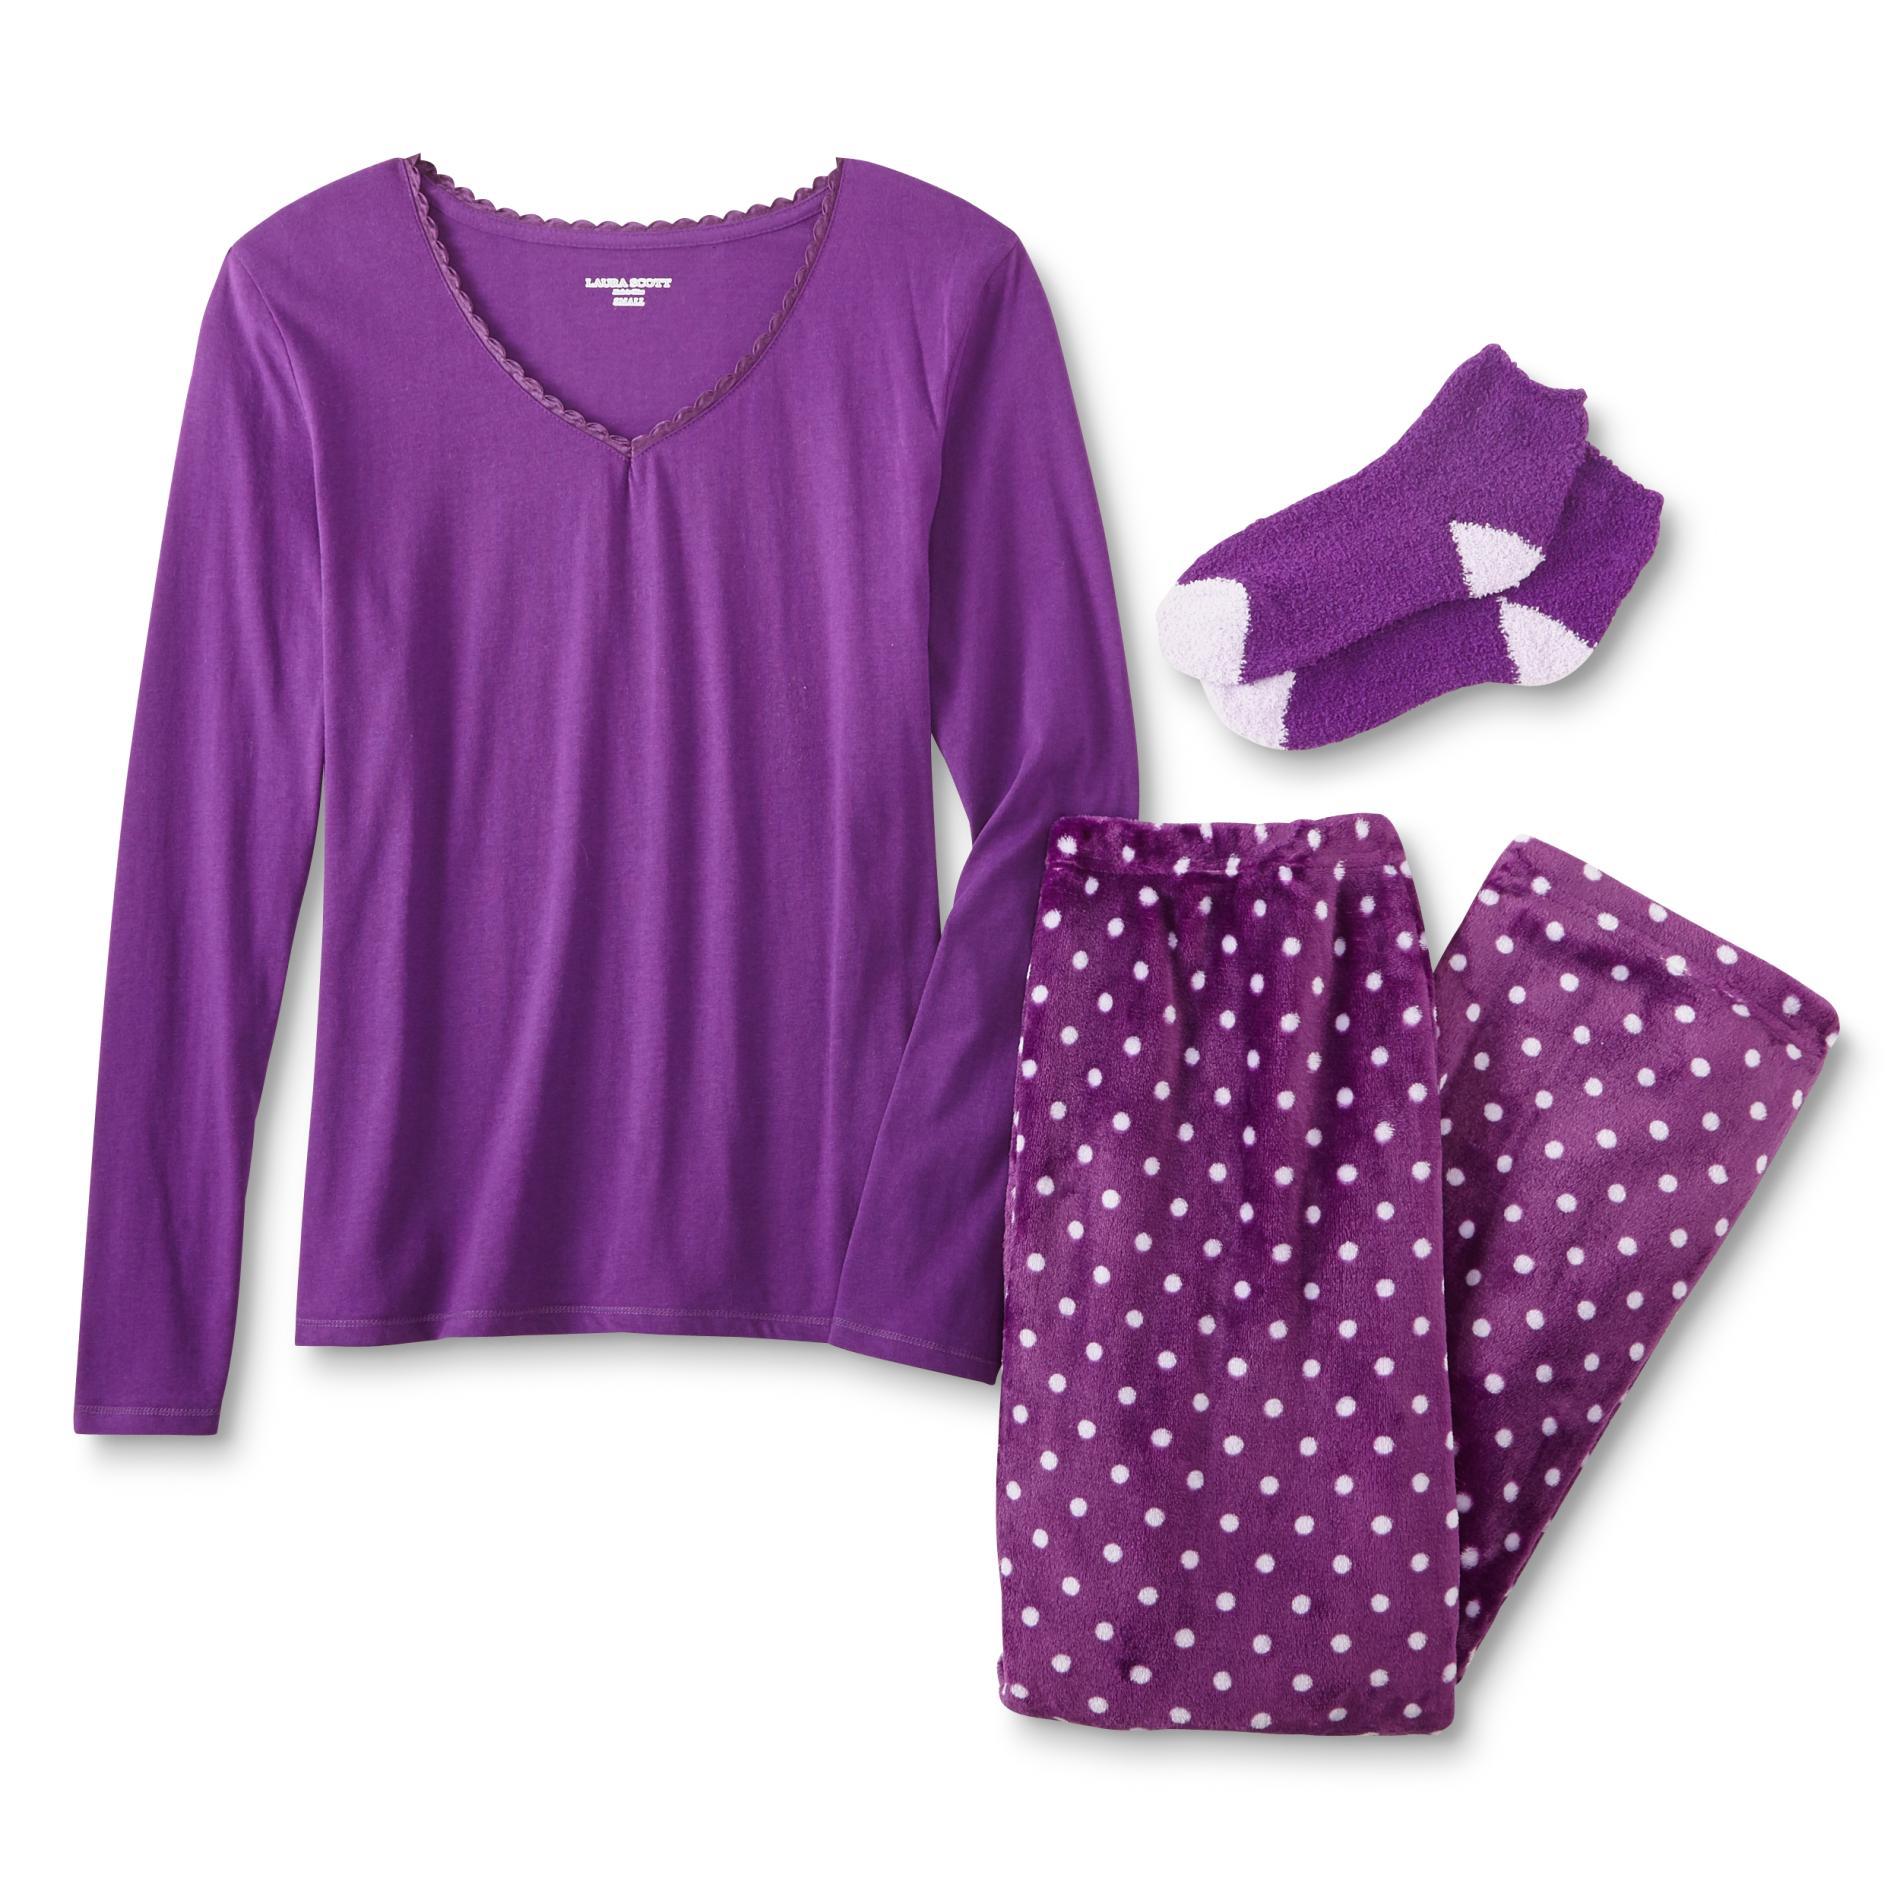 Laura scott women 39 s pajama shirt pants socks dots for Women s flannel sleep shirt